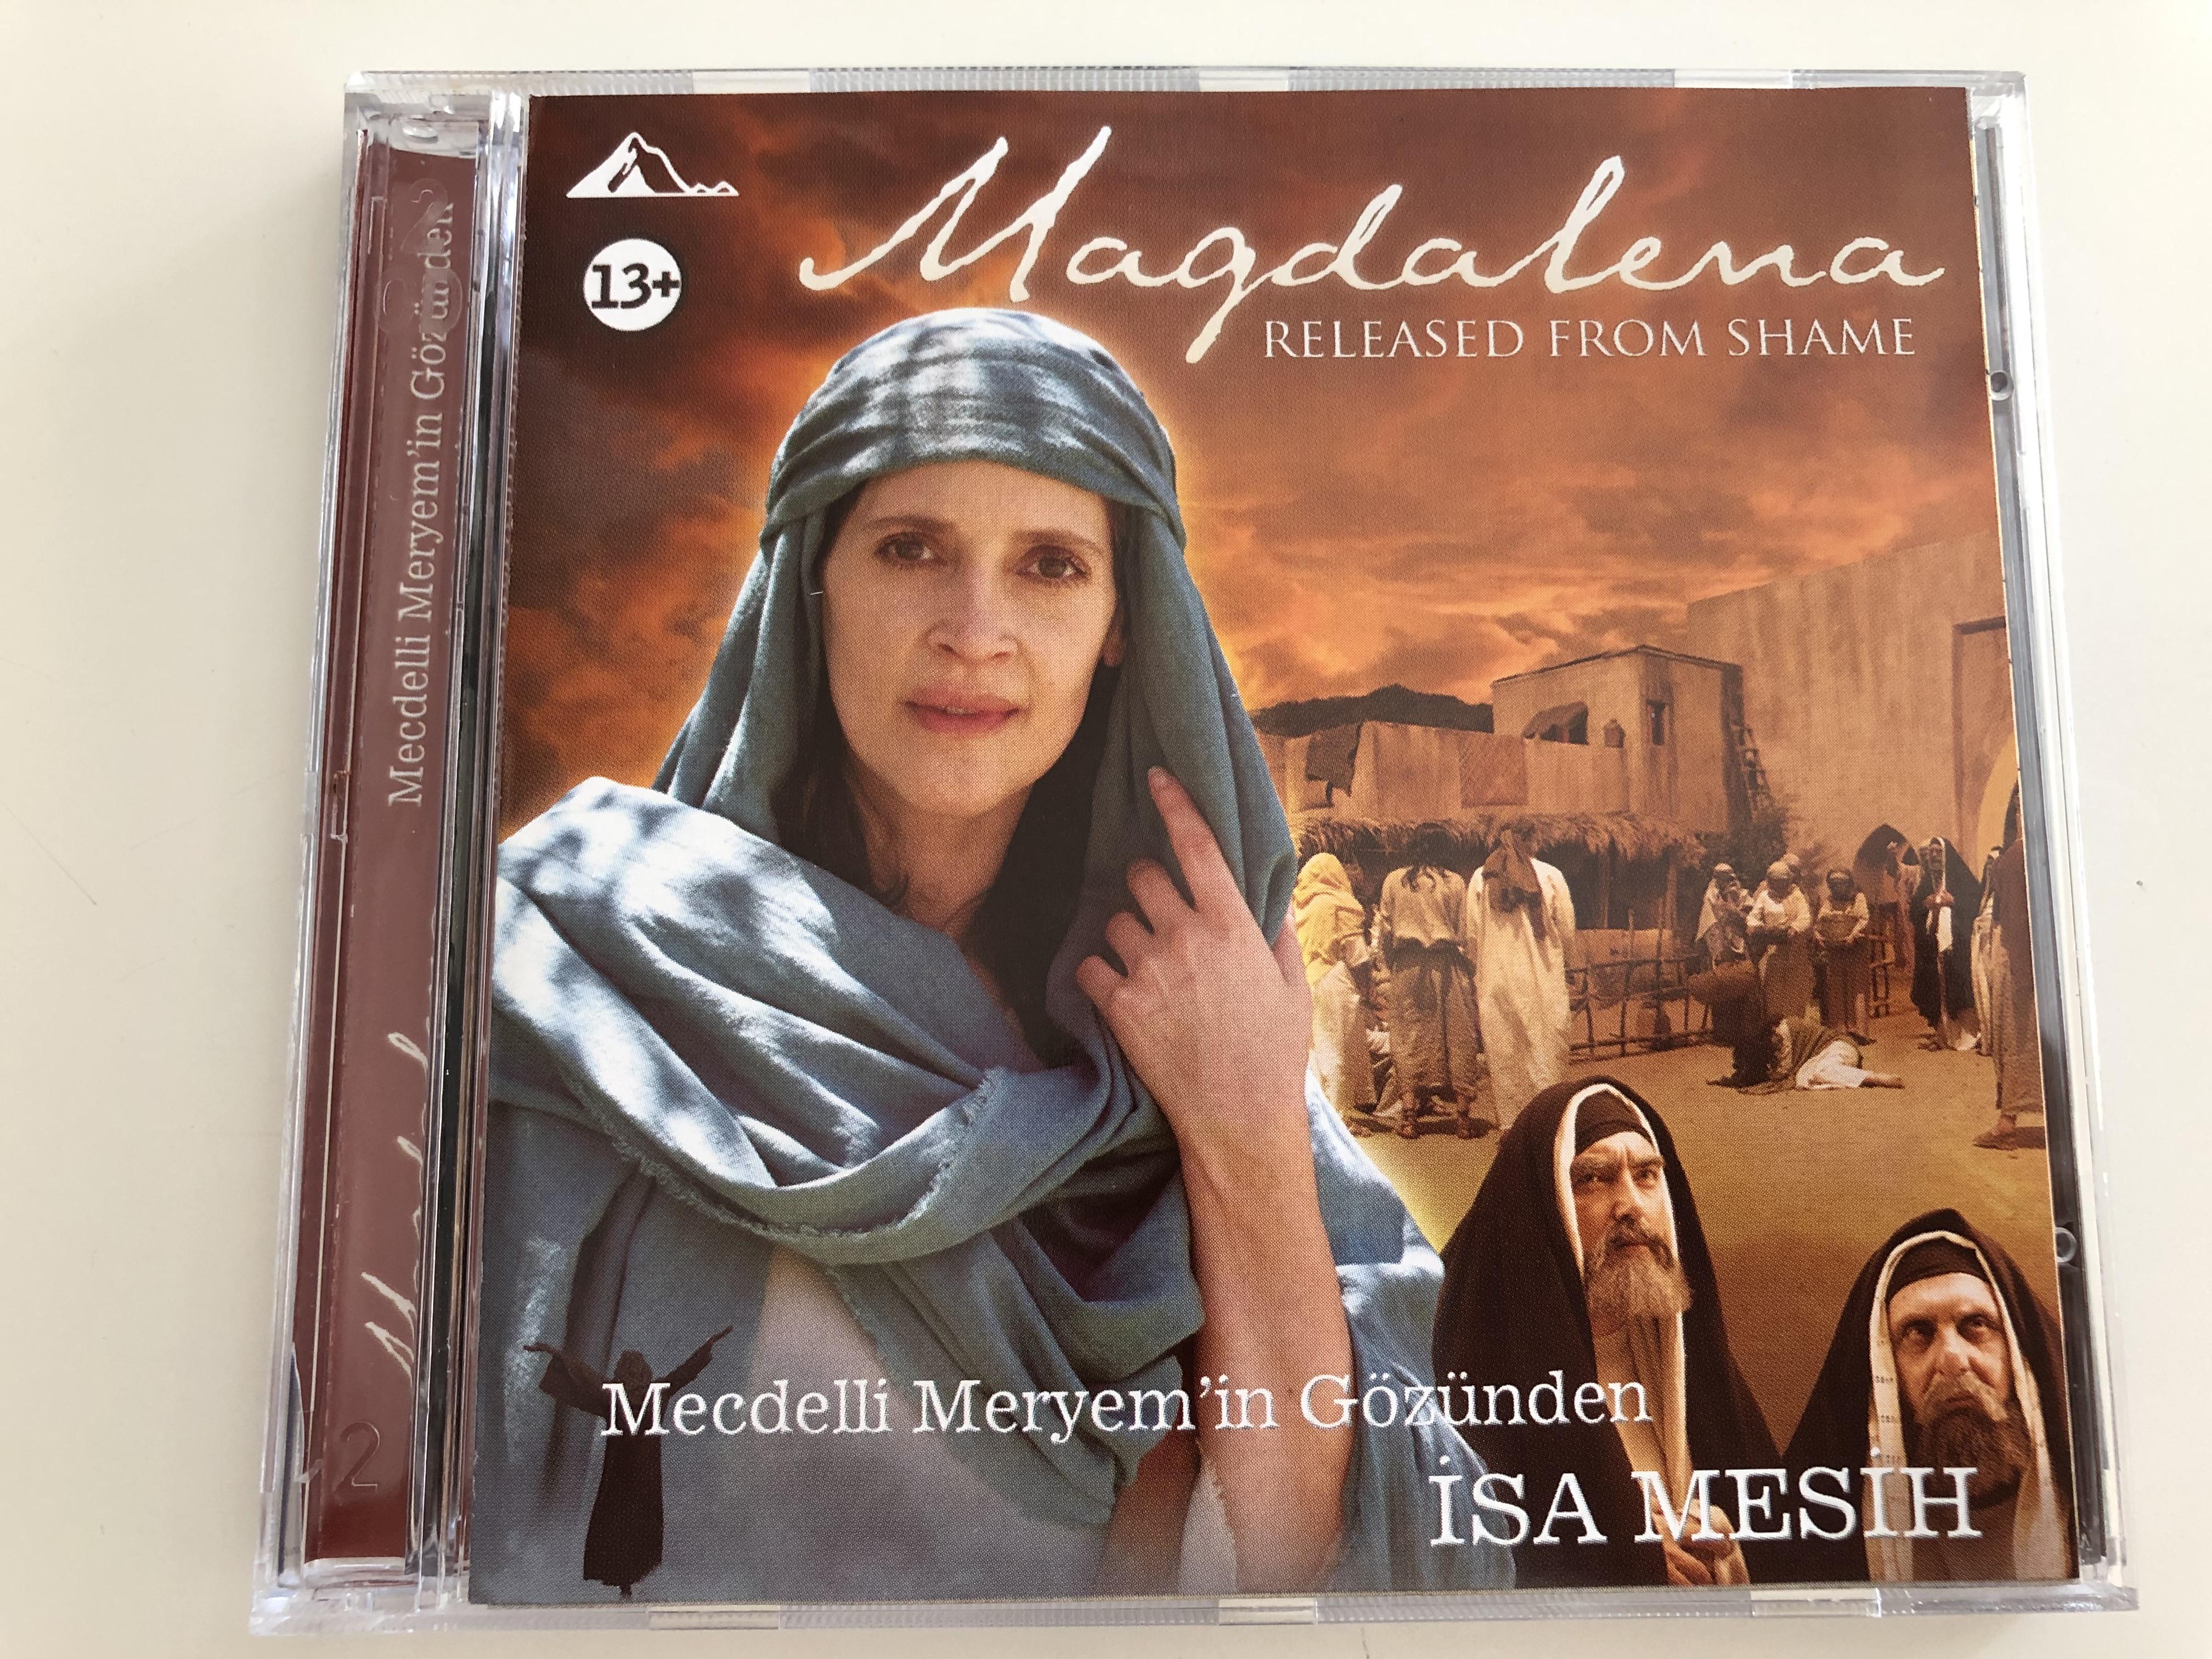 magdalena-released-from-shame-2x-vcd-1980-mecdelli-meryem-in-g-z-nden-sa-mesih-directed-by-charlie-brookins-jordan-starring-brian-deacon-rebecca-ritz-gigi-orsillo-shira-lane-1-.jpg